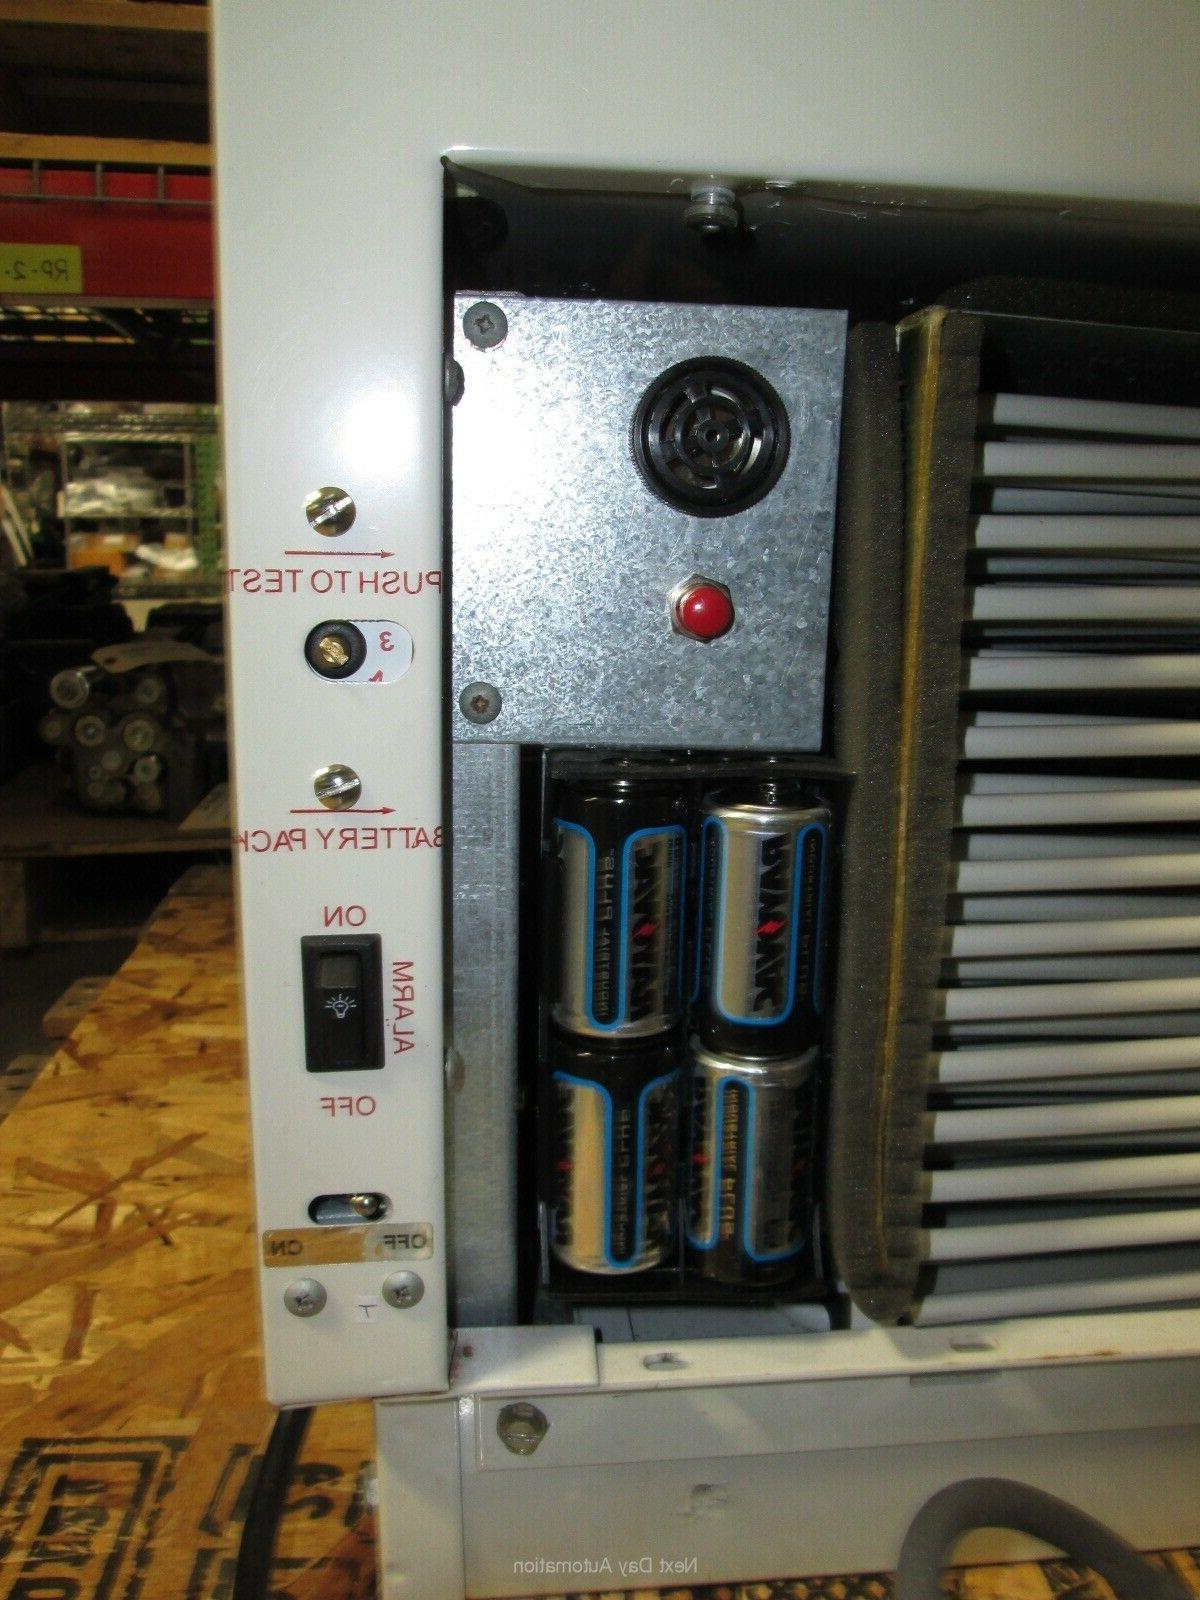 Kelvinator UC540 Chest Freezer Tested -46°C w/ Recorder